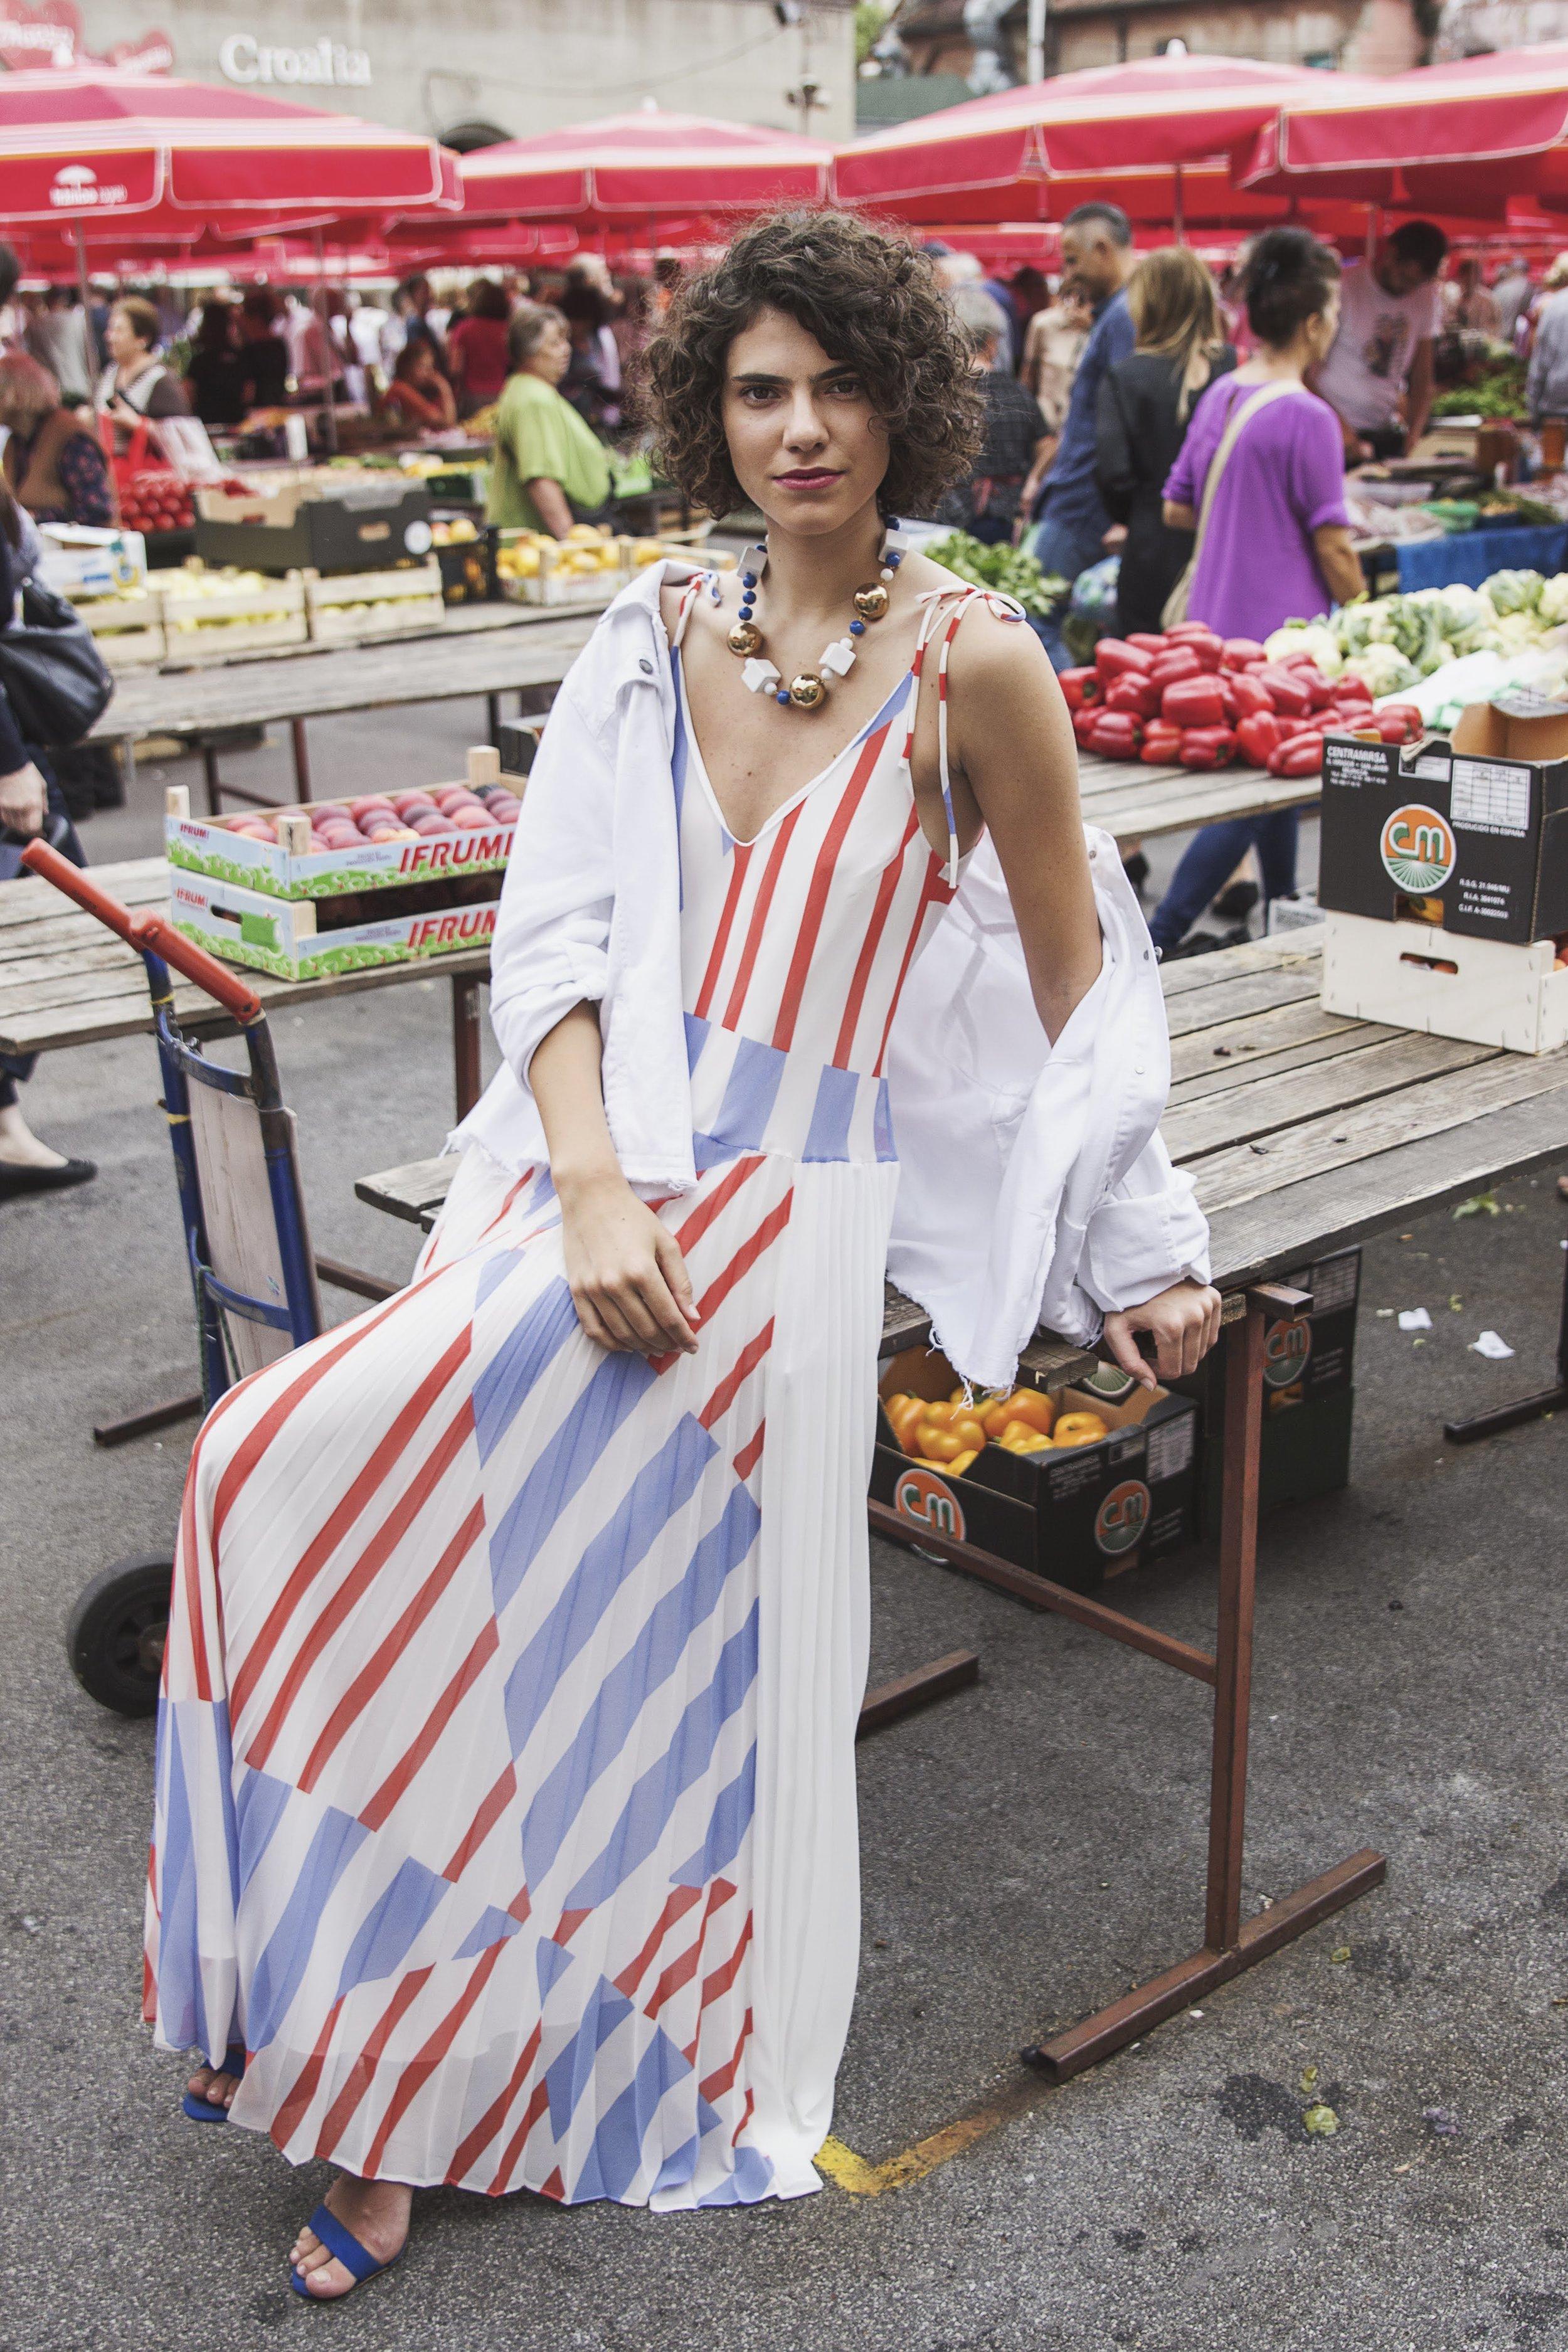 luka-lajic-fashion-photography-robert-sever-dizajner-croatian (12).jpg